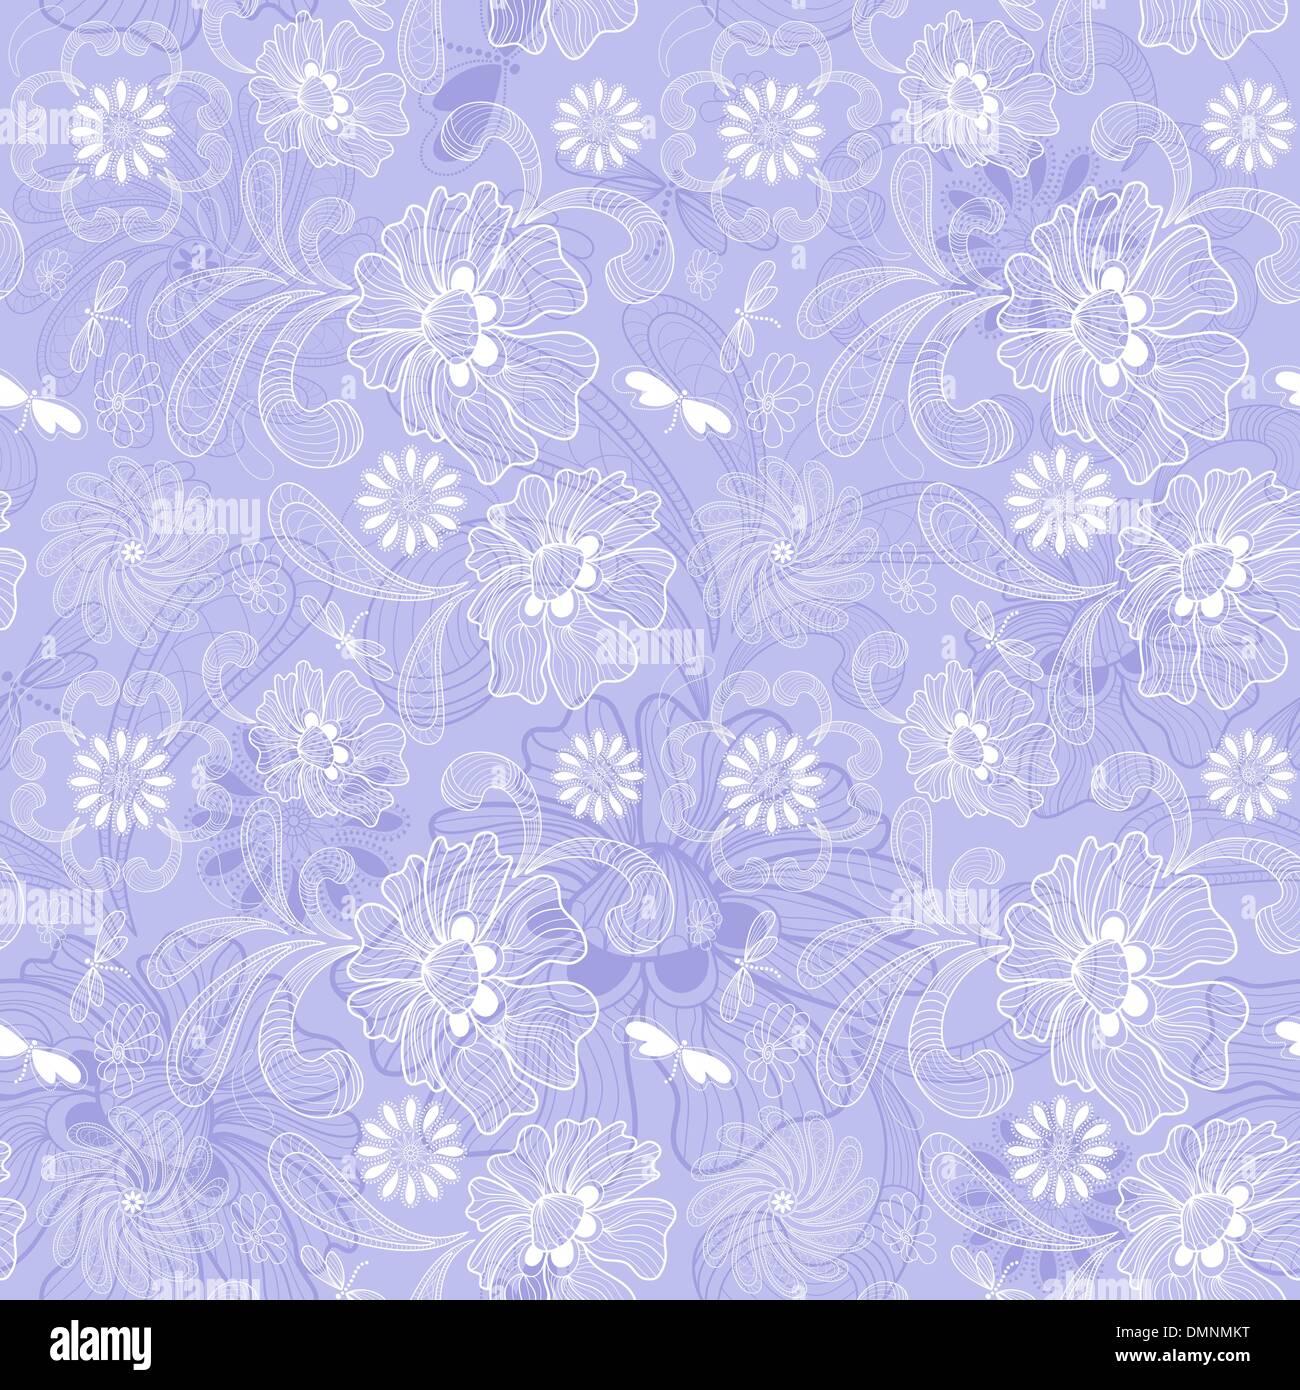 Gentle seamless pattern - Stock Image